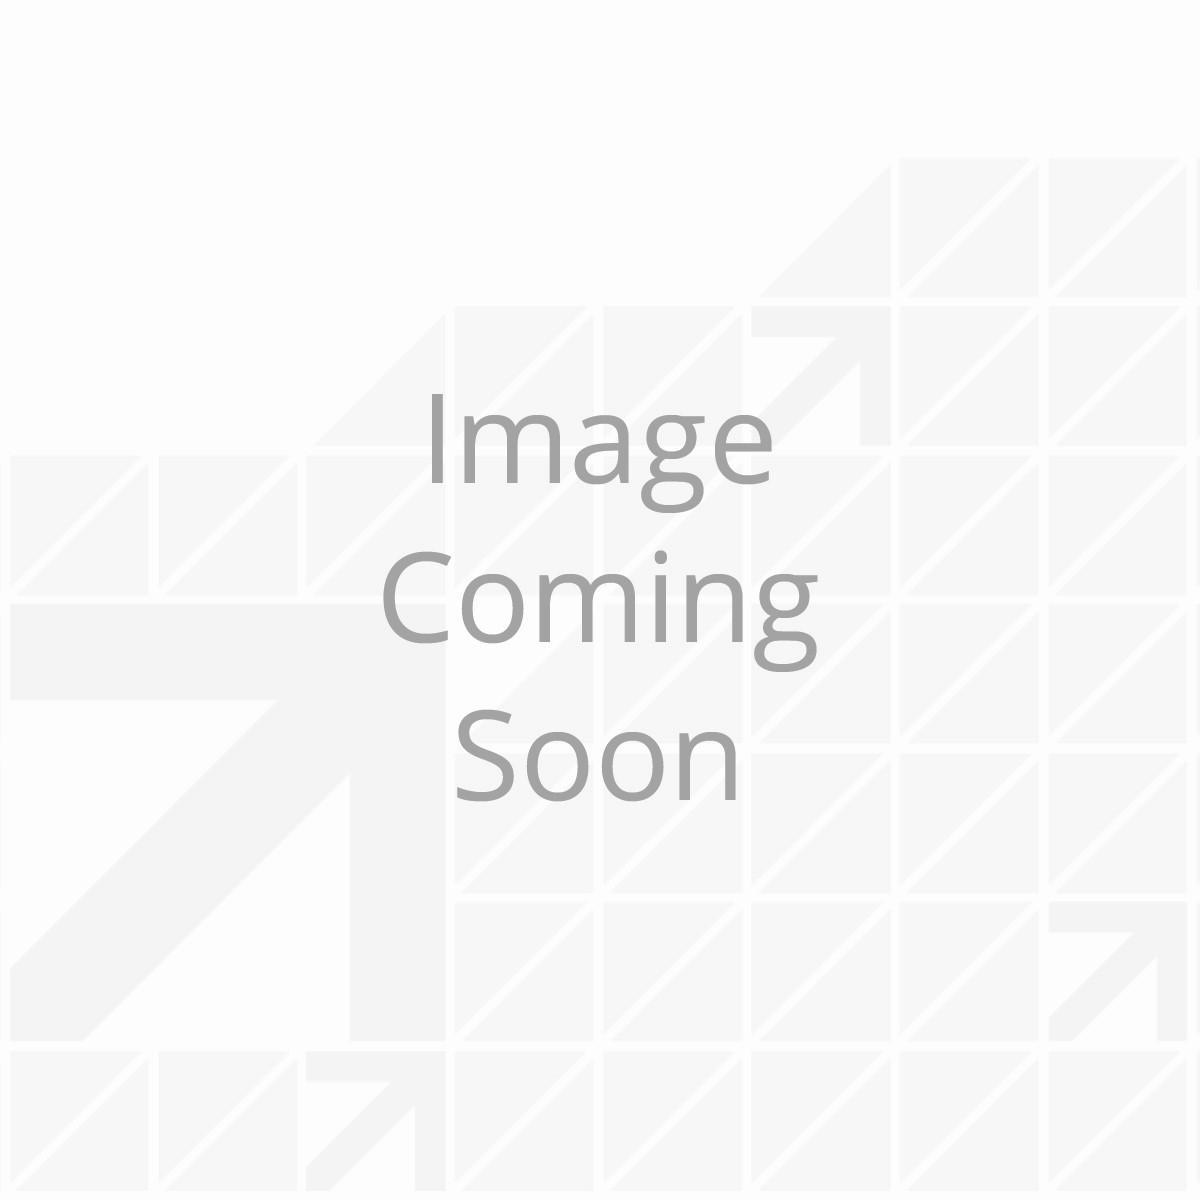 Dust Cap for Standard Axle Hub (2,000-3,500 lbs.) - 10 Pack